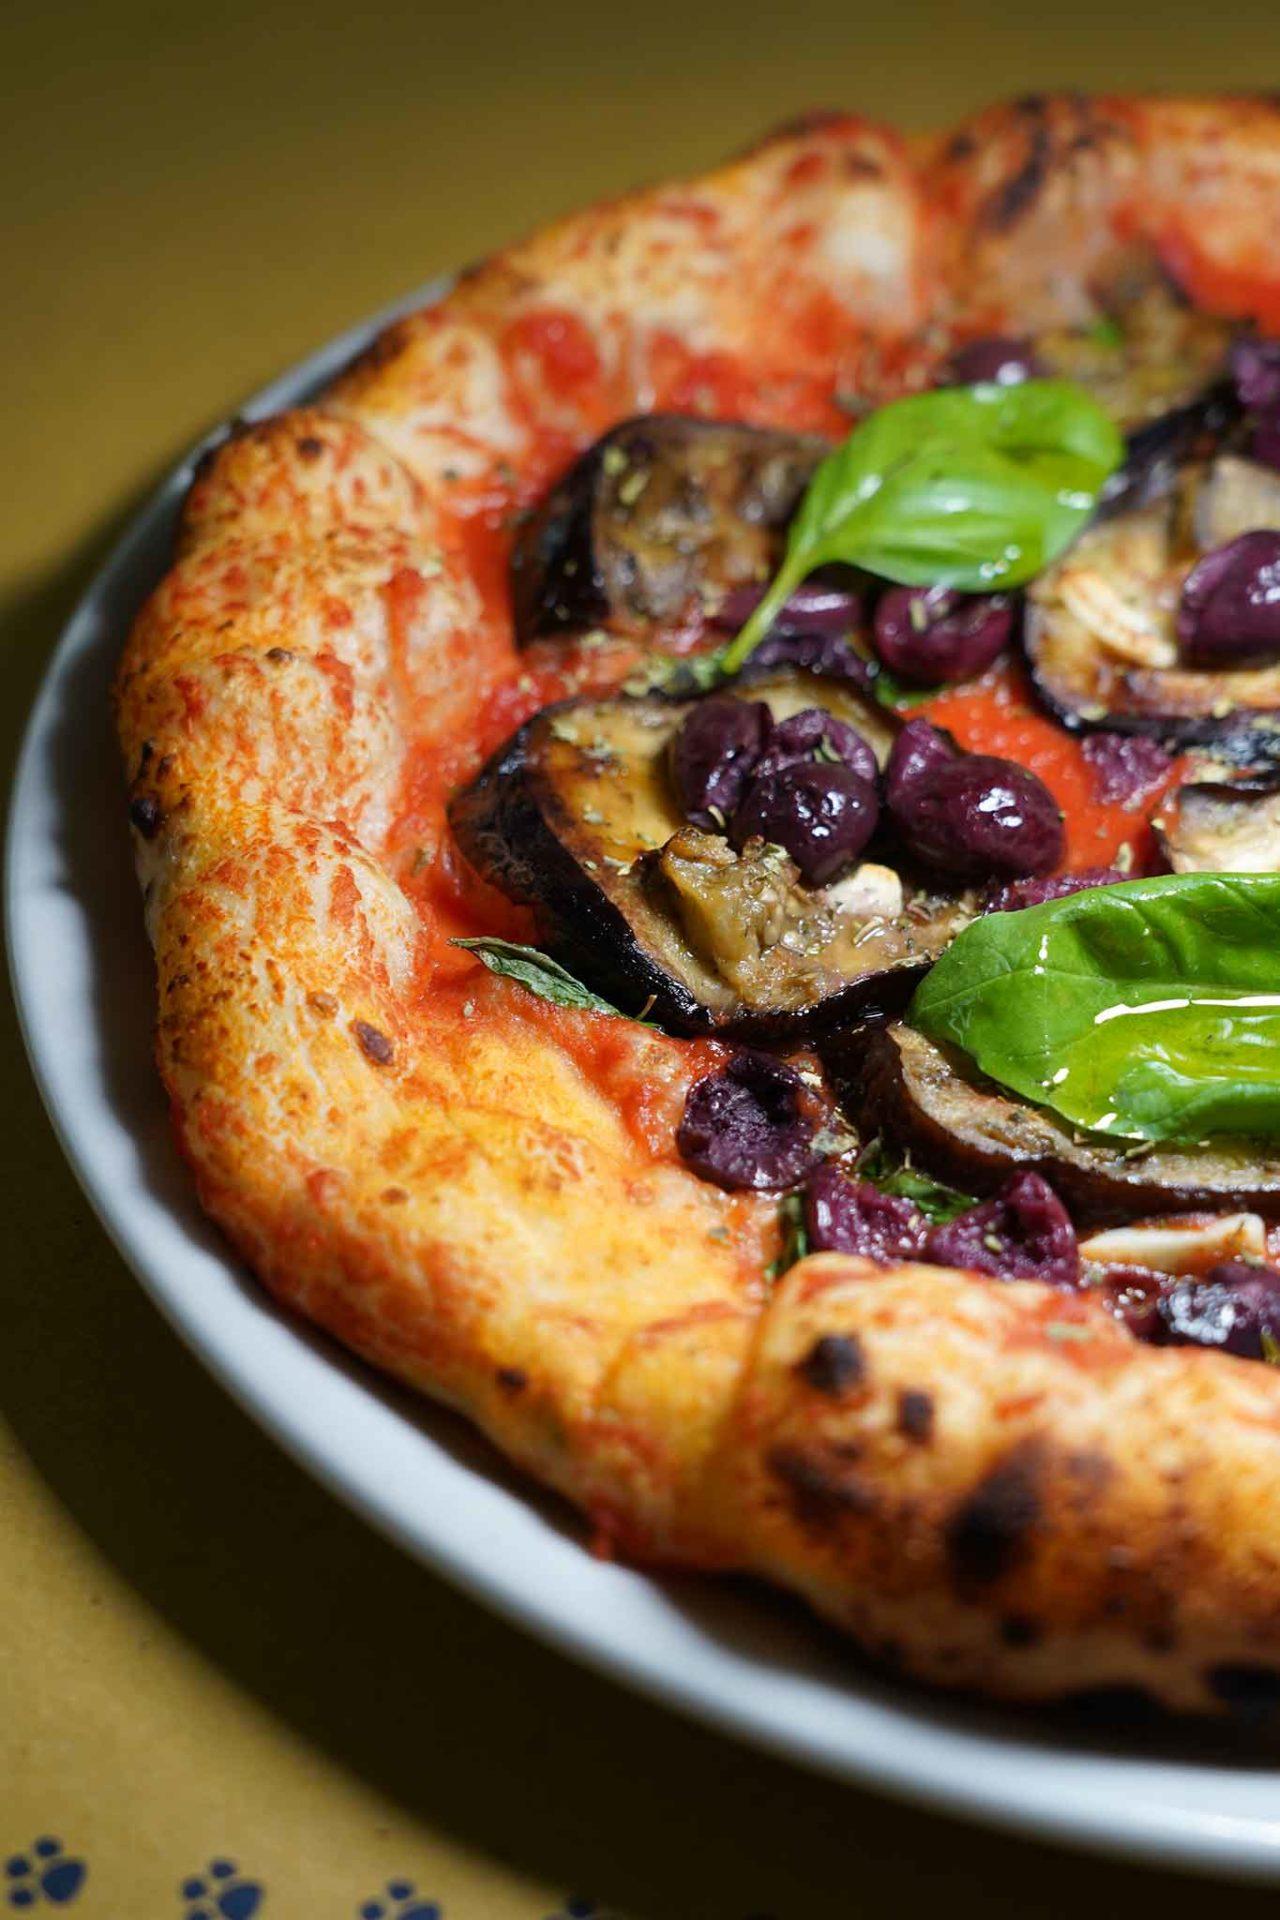 pizza vegetariana Marinara di Greta pizzeria La Gatta Mangiona Roma